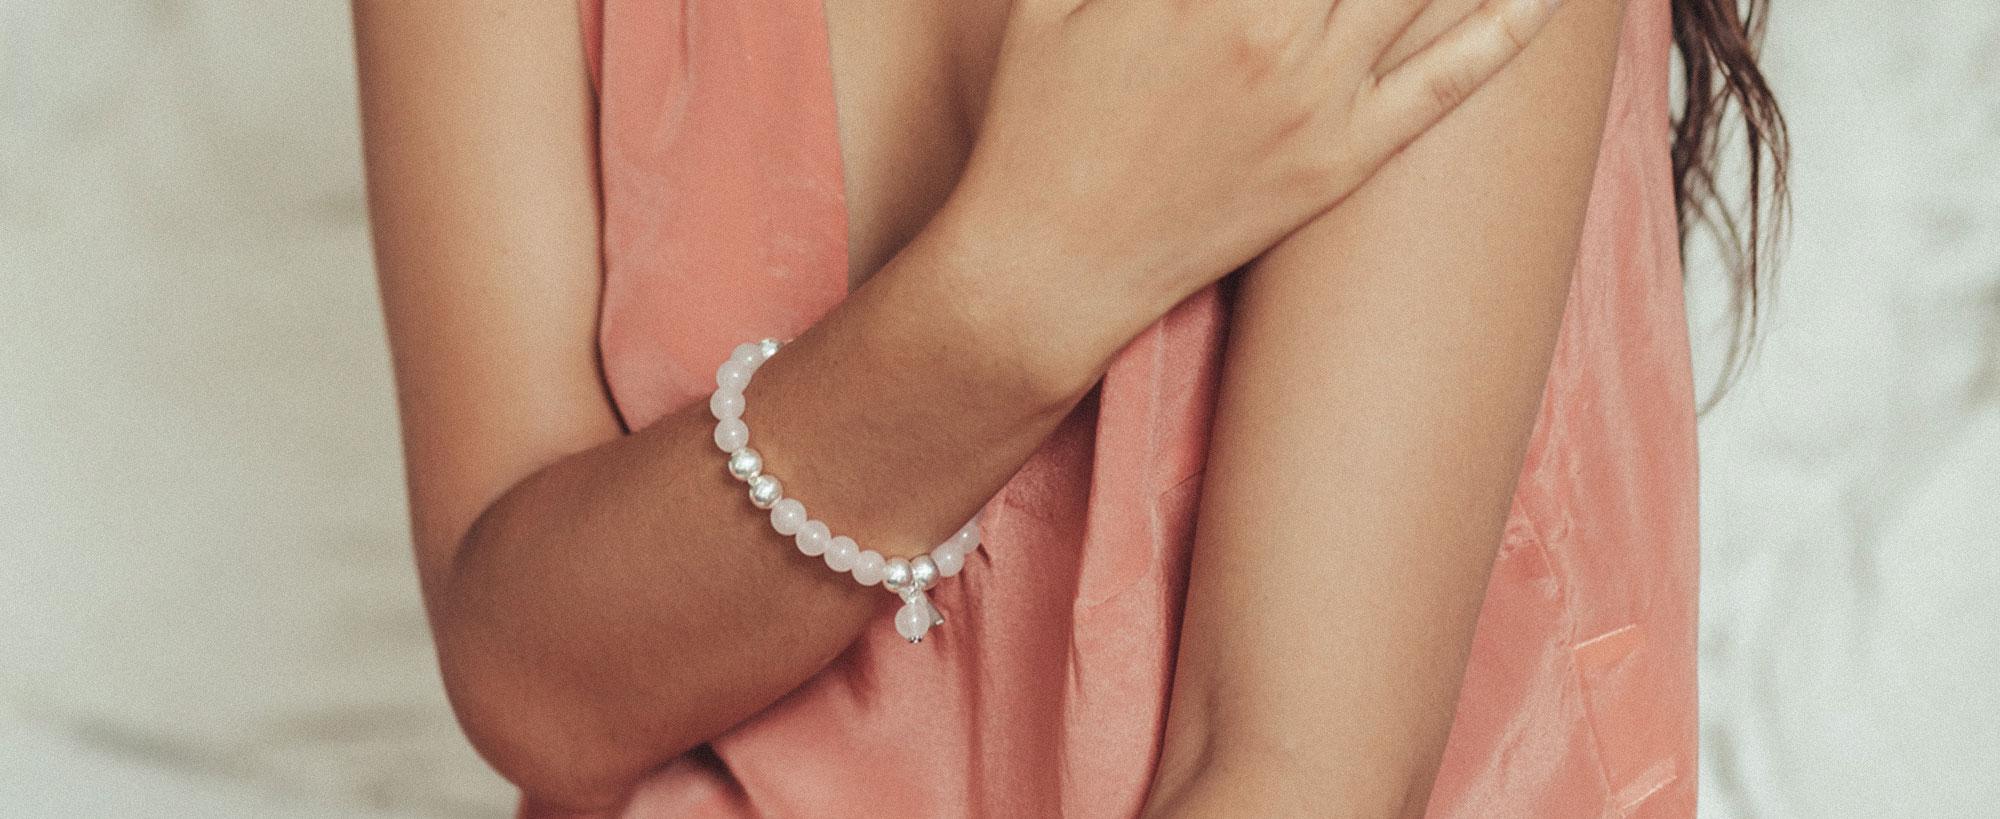 Perle de Jade Bracelet pierres naturelles good karma